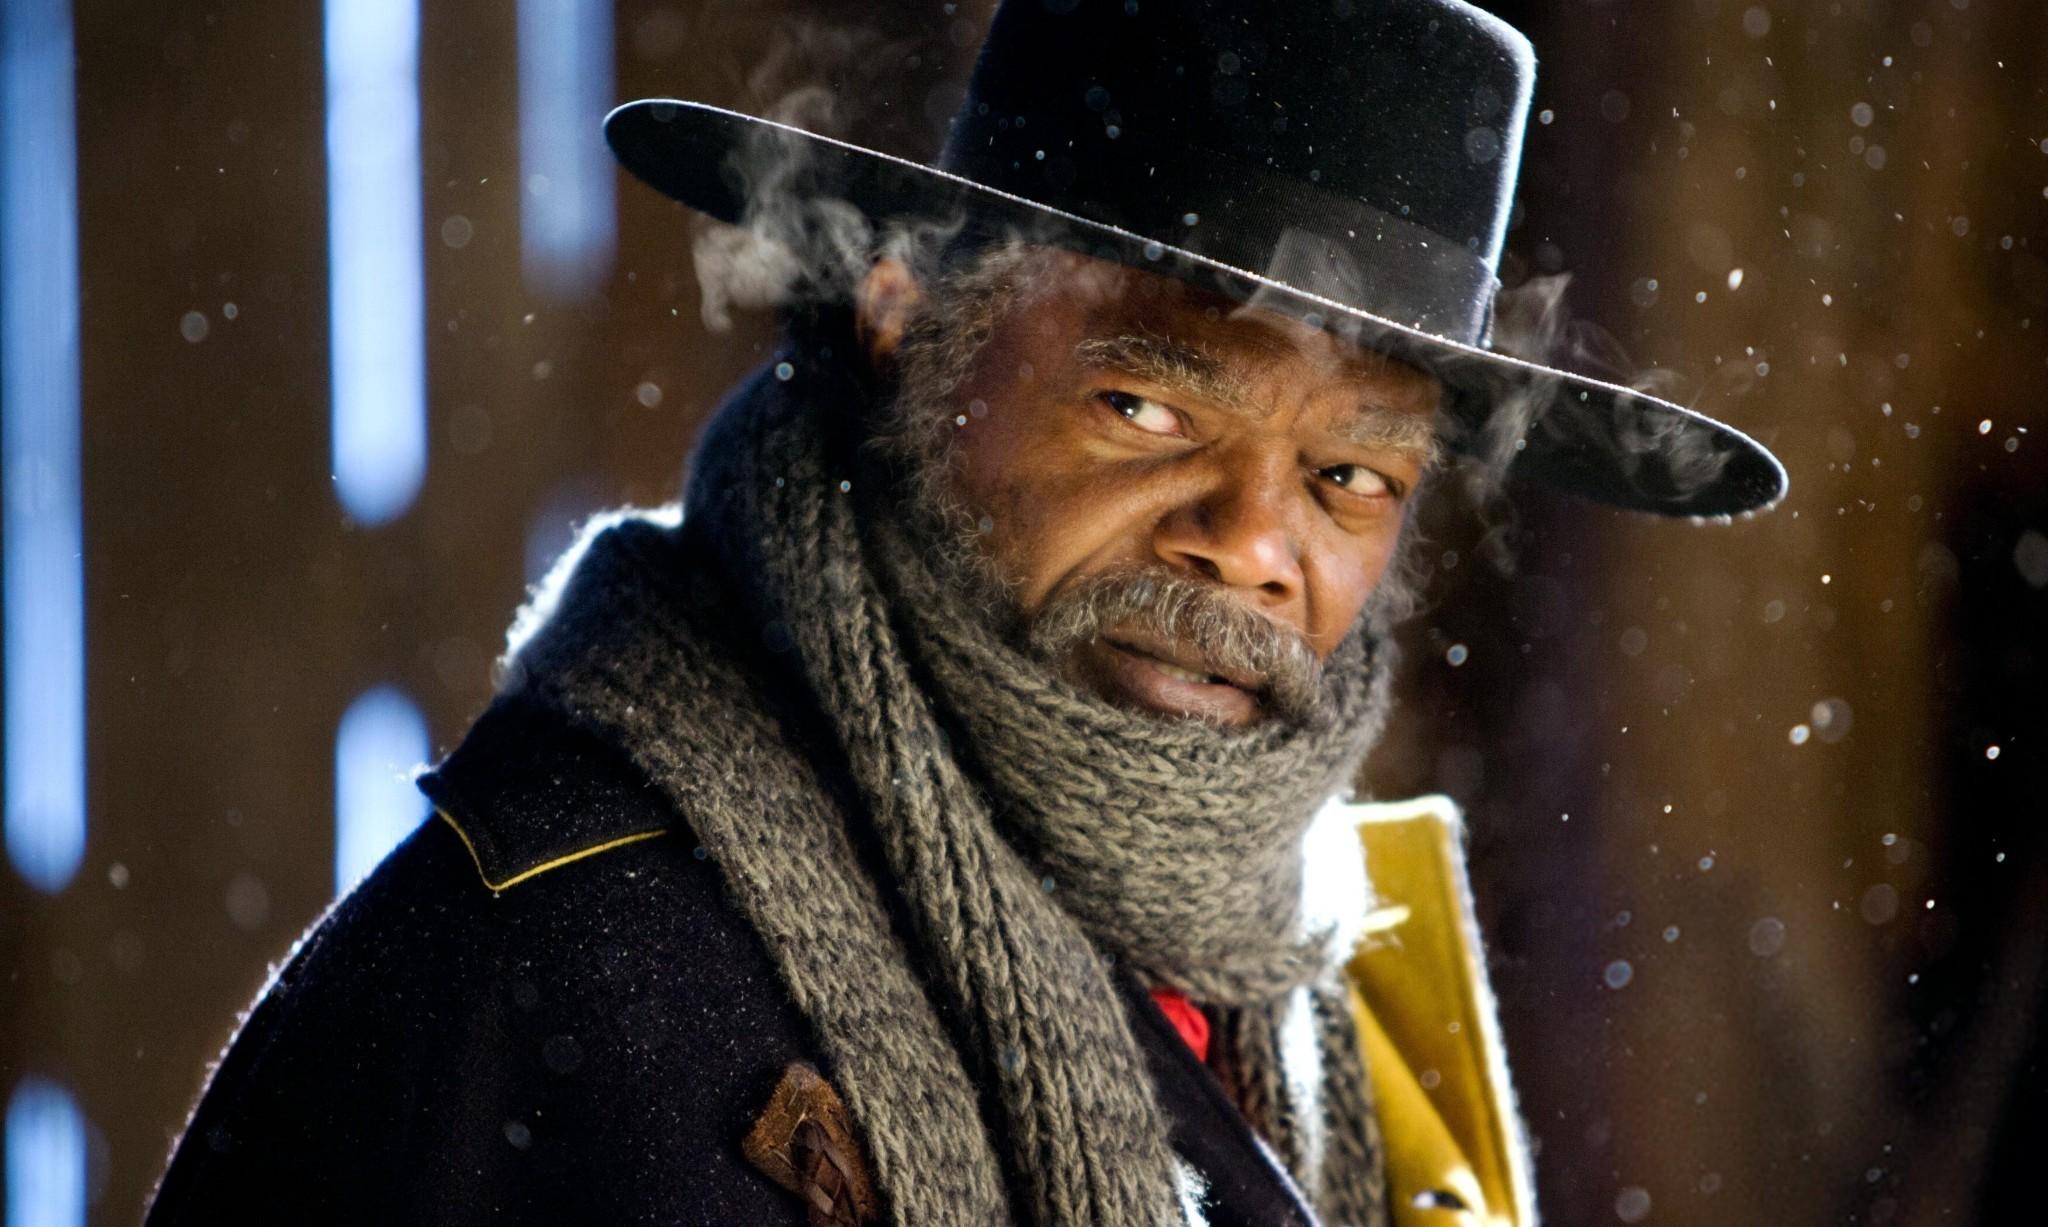 The Hateful Eight: trailer for Tarantino's Oscar-tipped western breaks cover